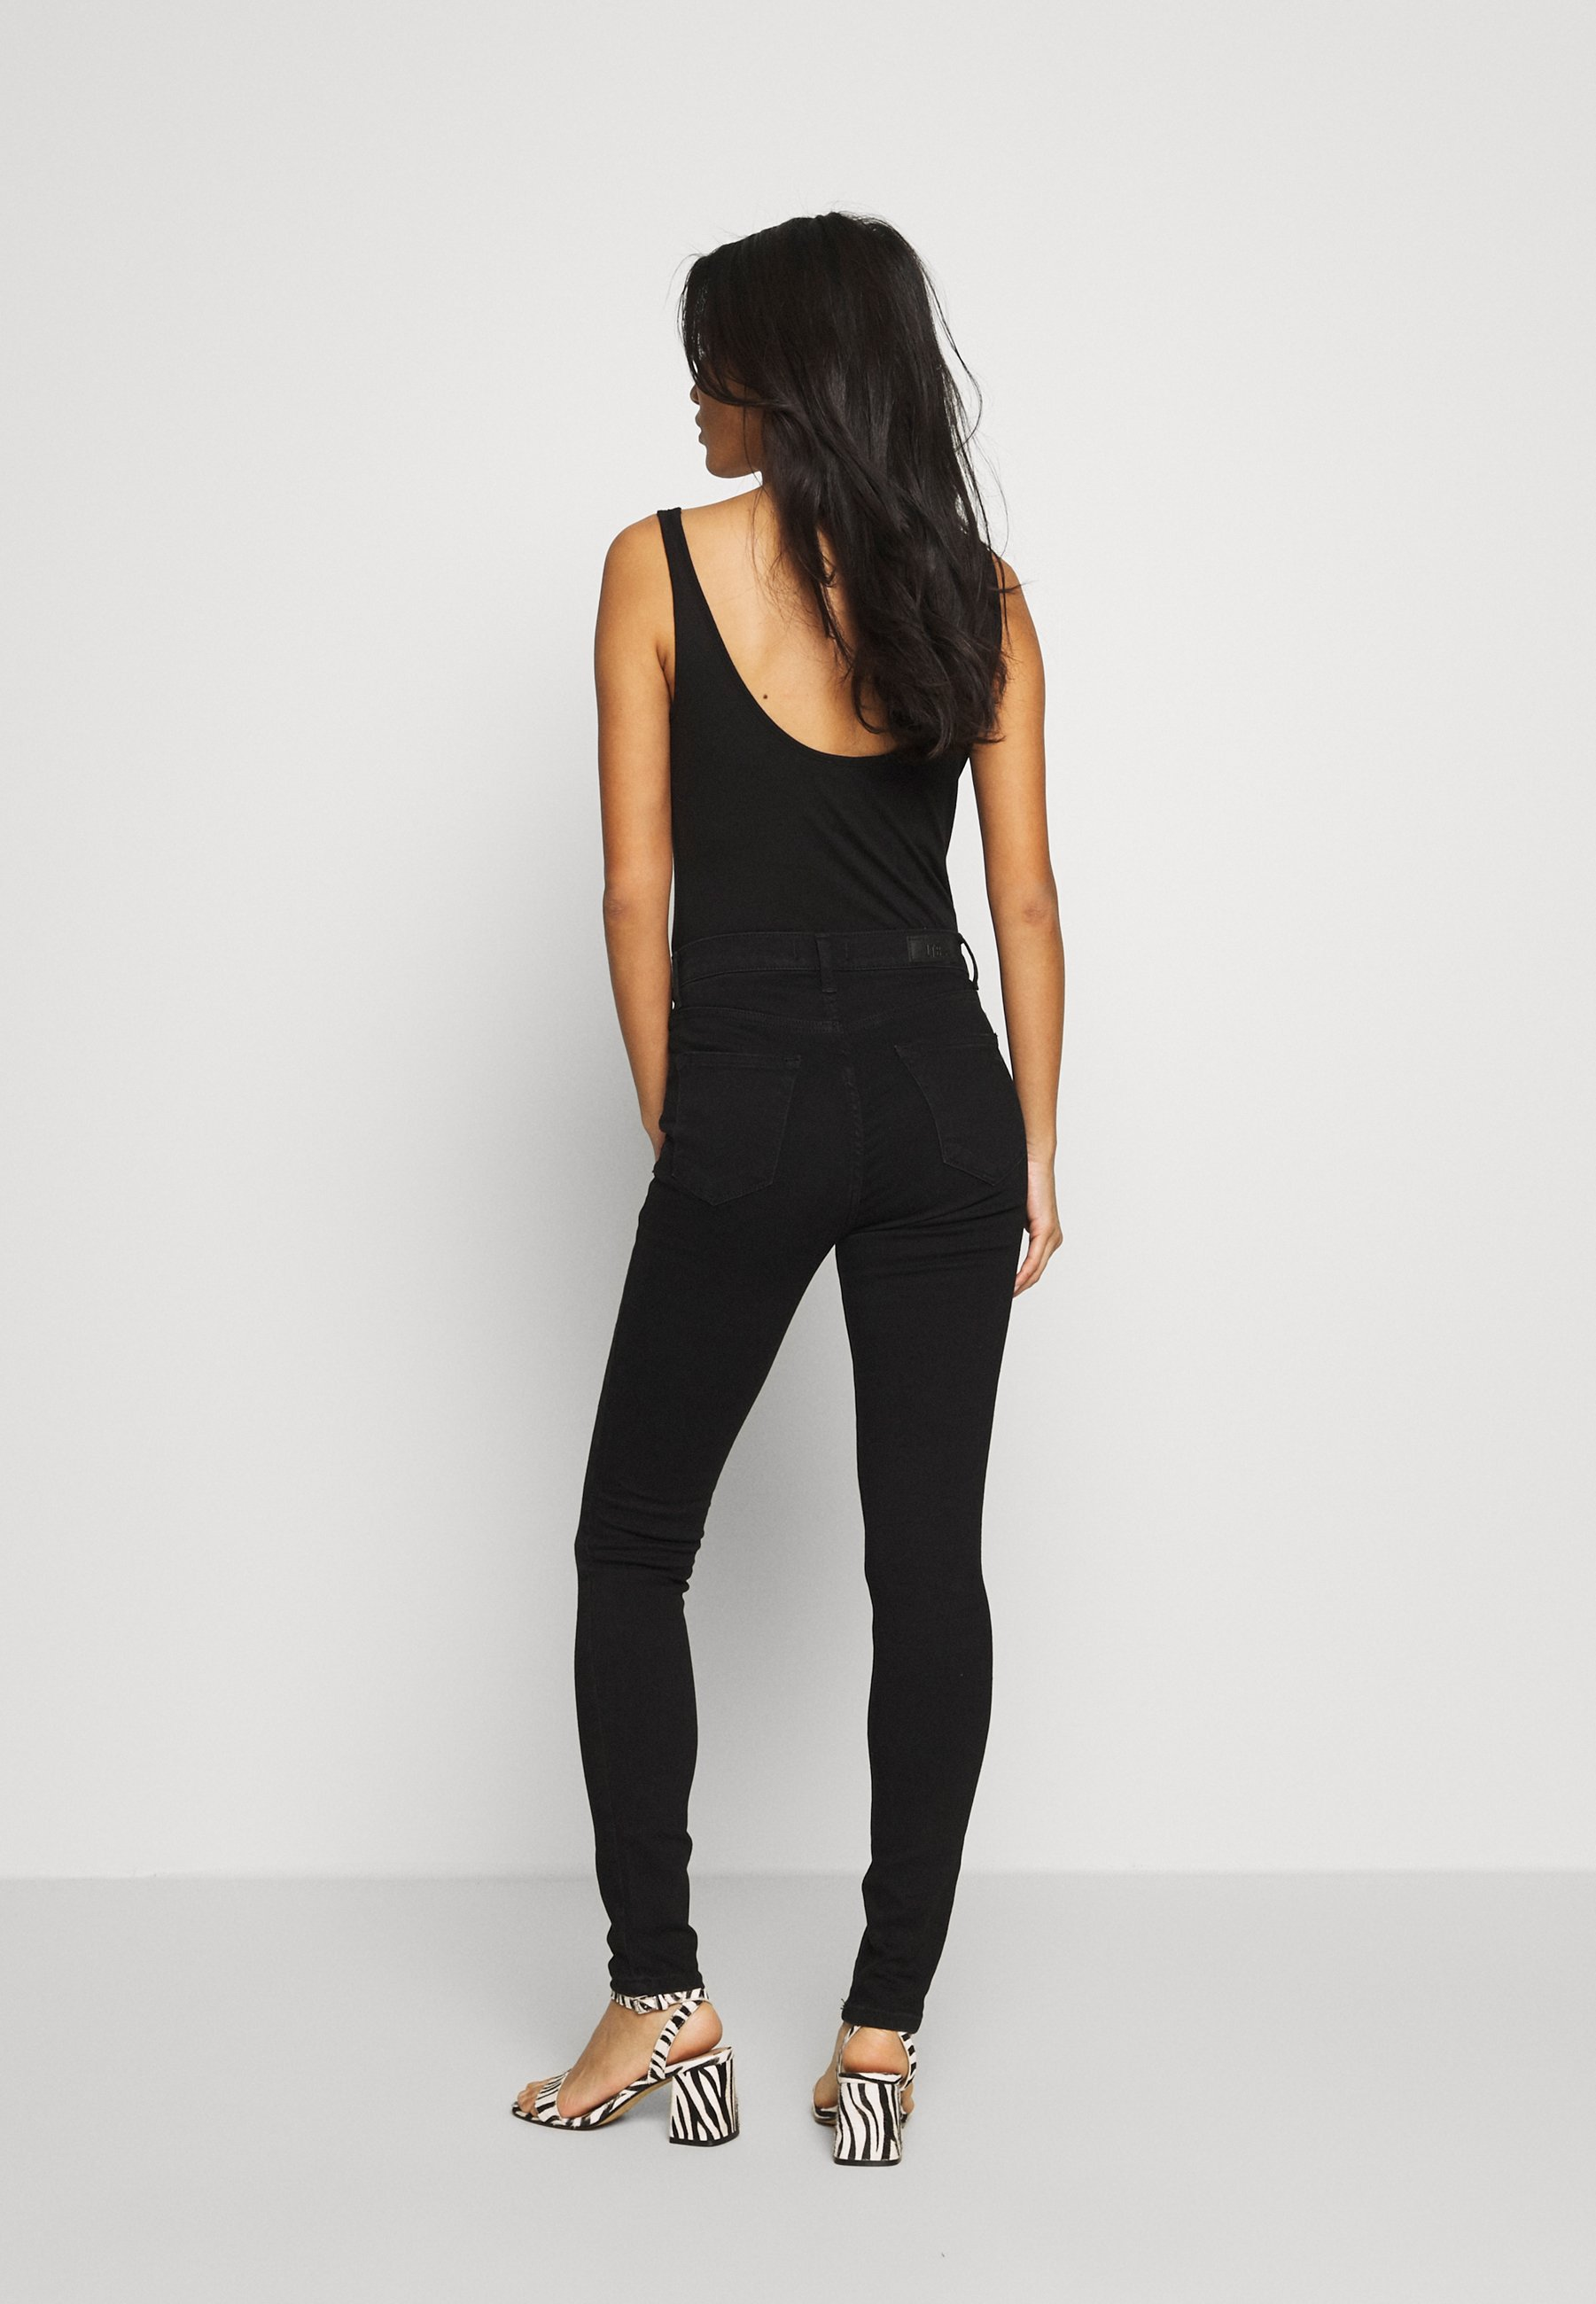 LTB AMY - Jeans Skinny - black - Jeans Femme MzOx4